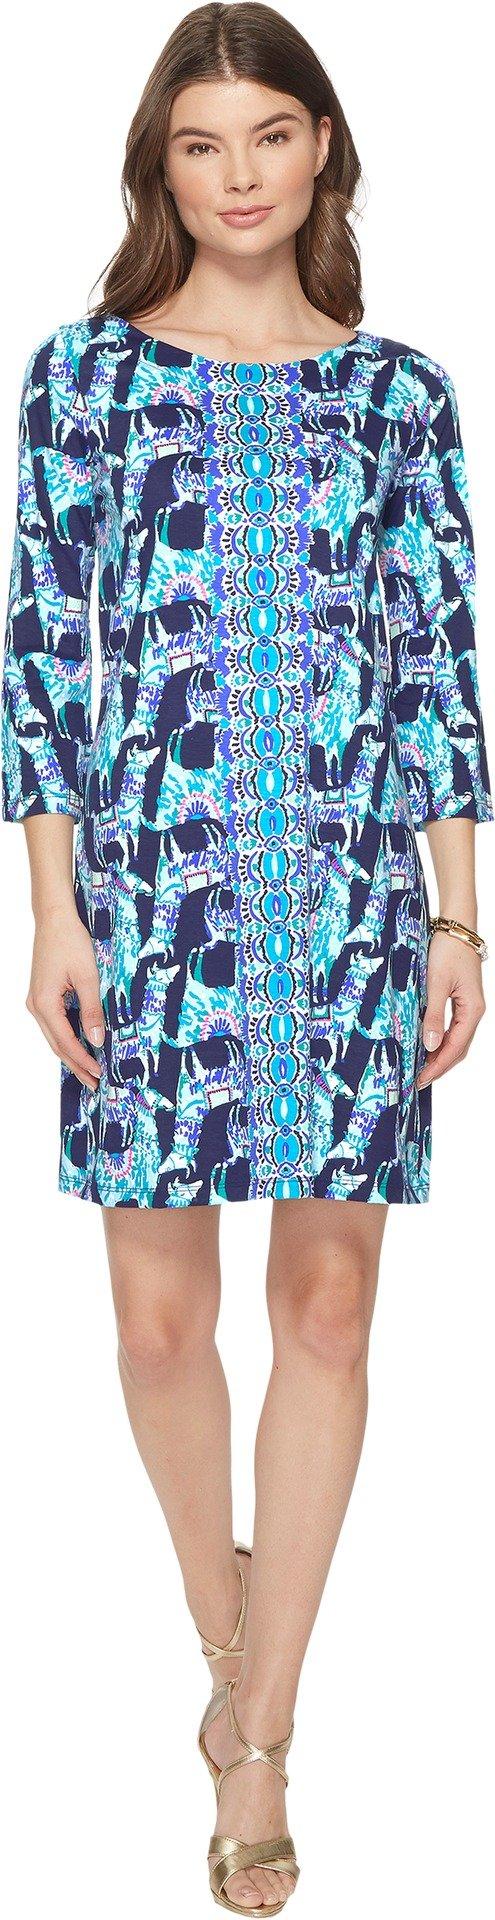 Lilly Pulitzer Women's Bay Dress Bright Navy Alpaca My Bags Engineered Dress X-Small